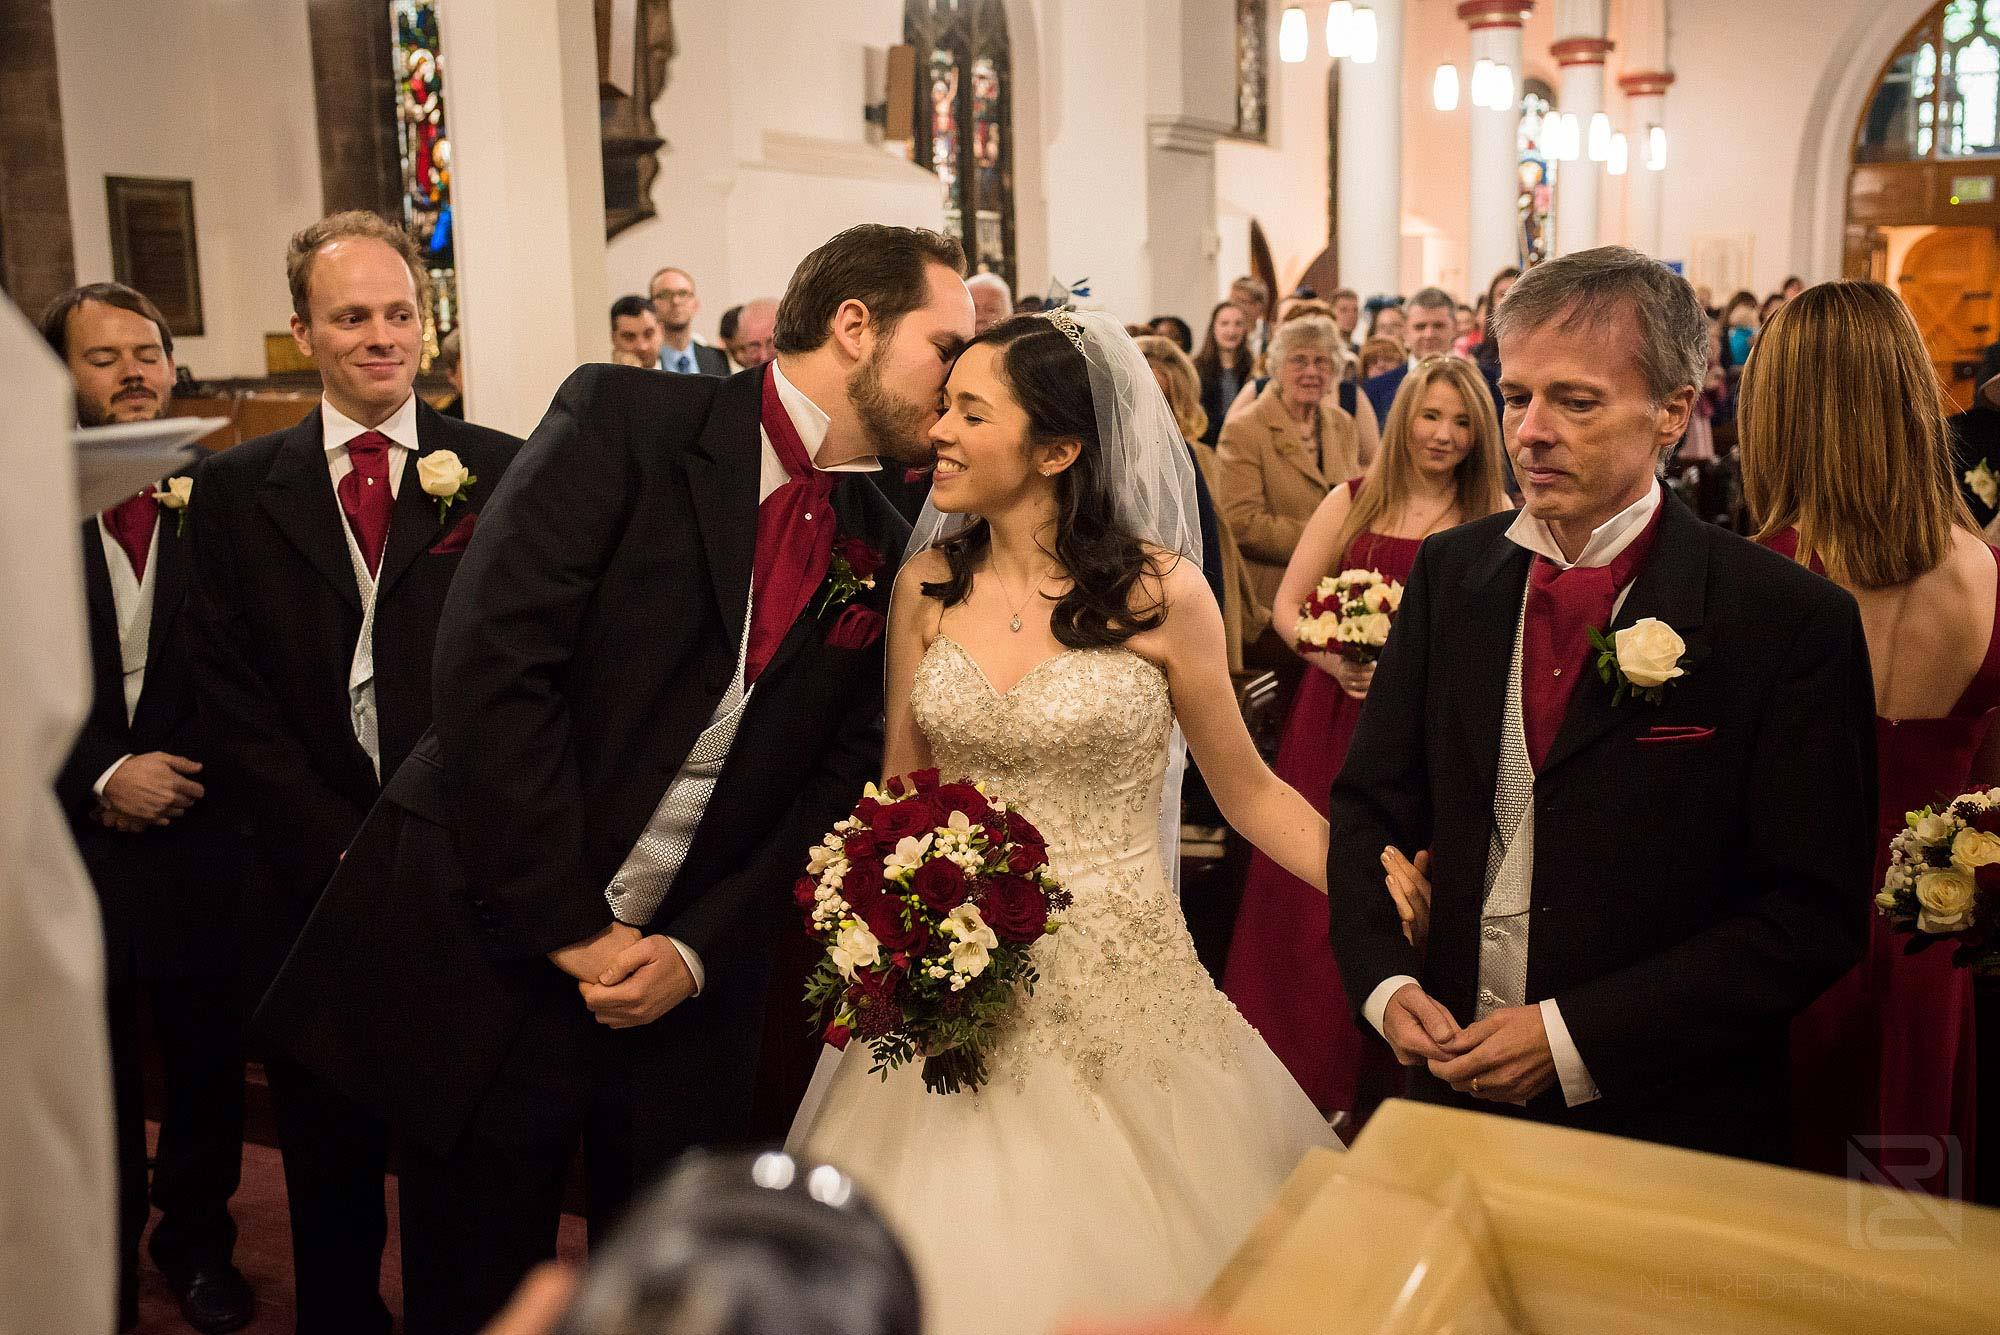 groom kissing bride during wedding ceremony